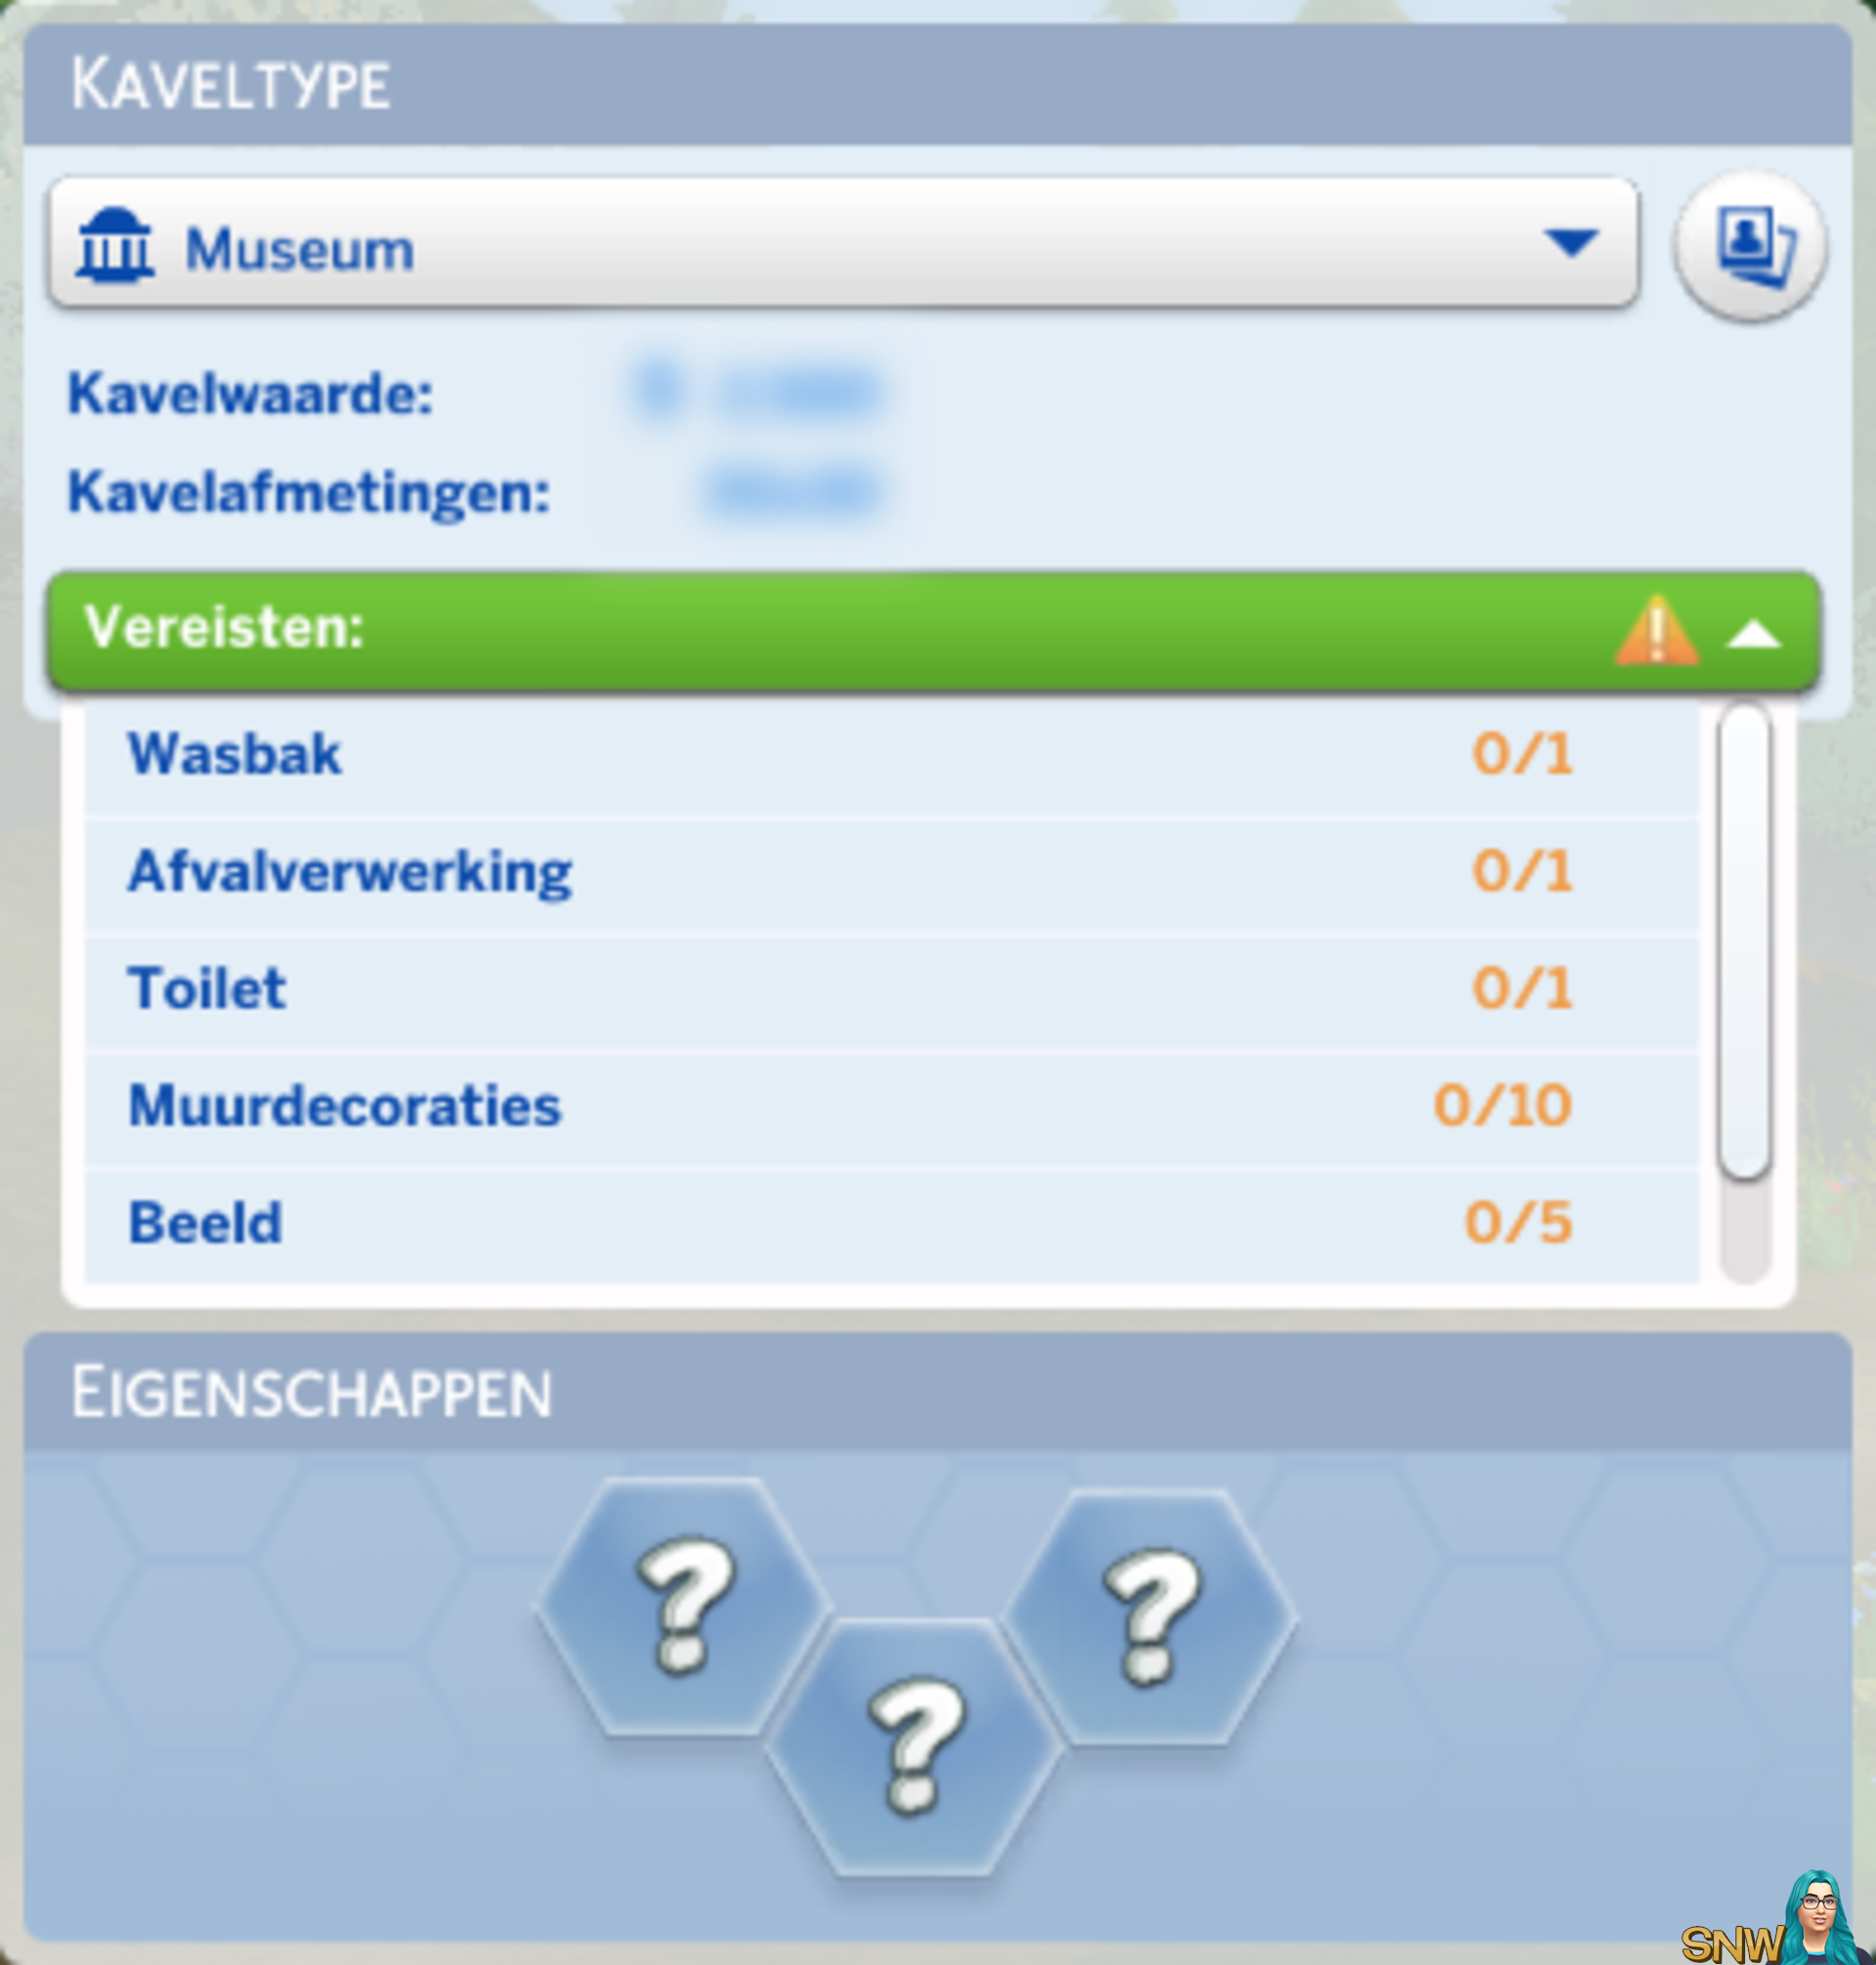 De Sims 4 kaveltype Museum